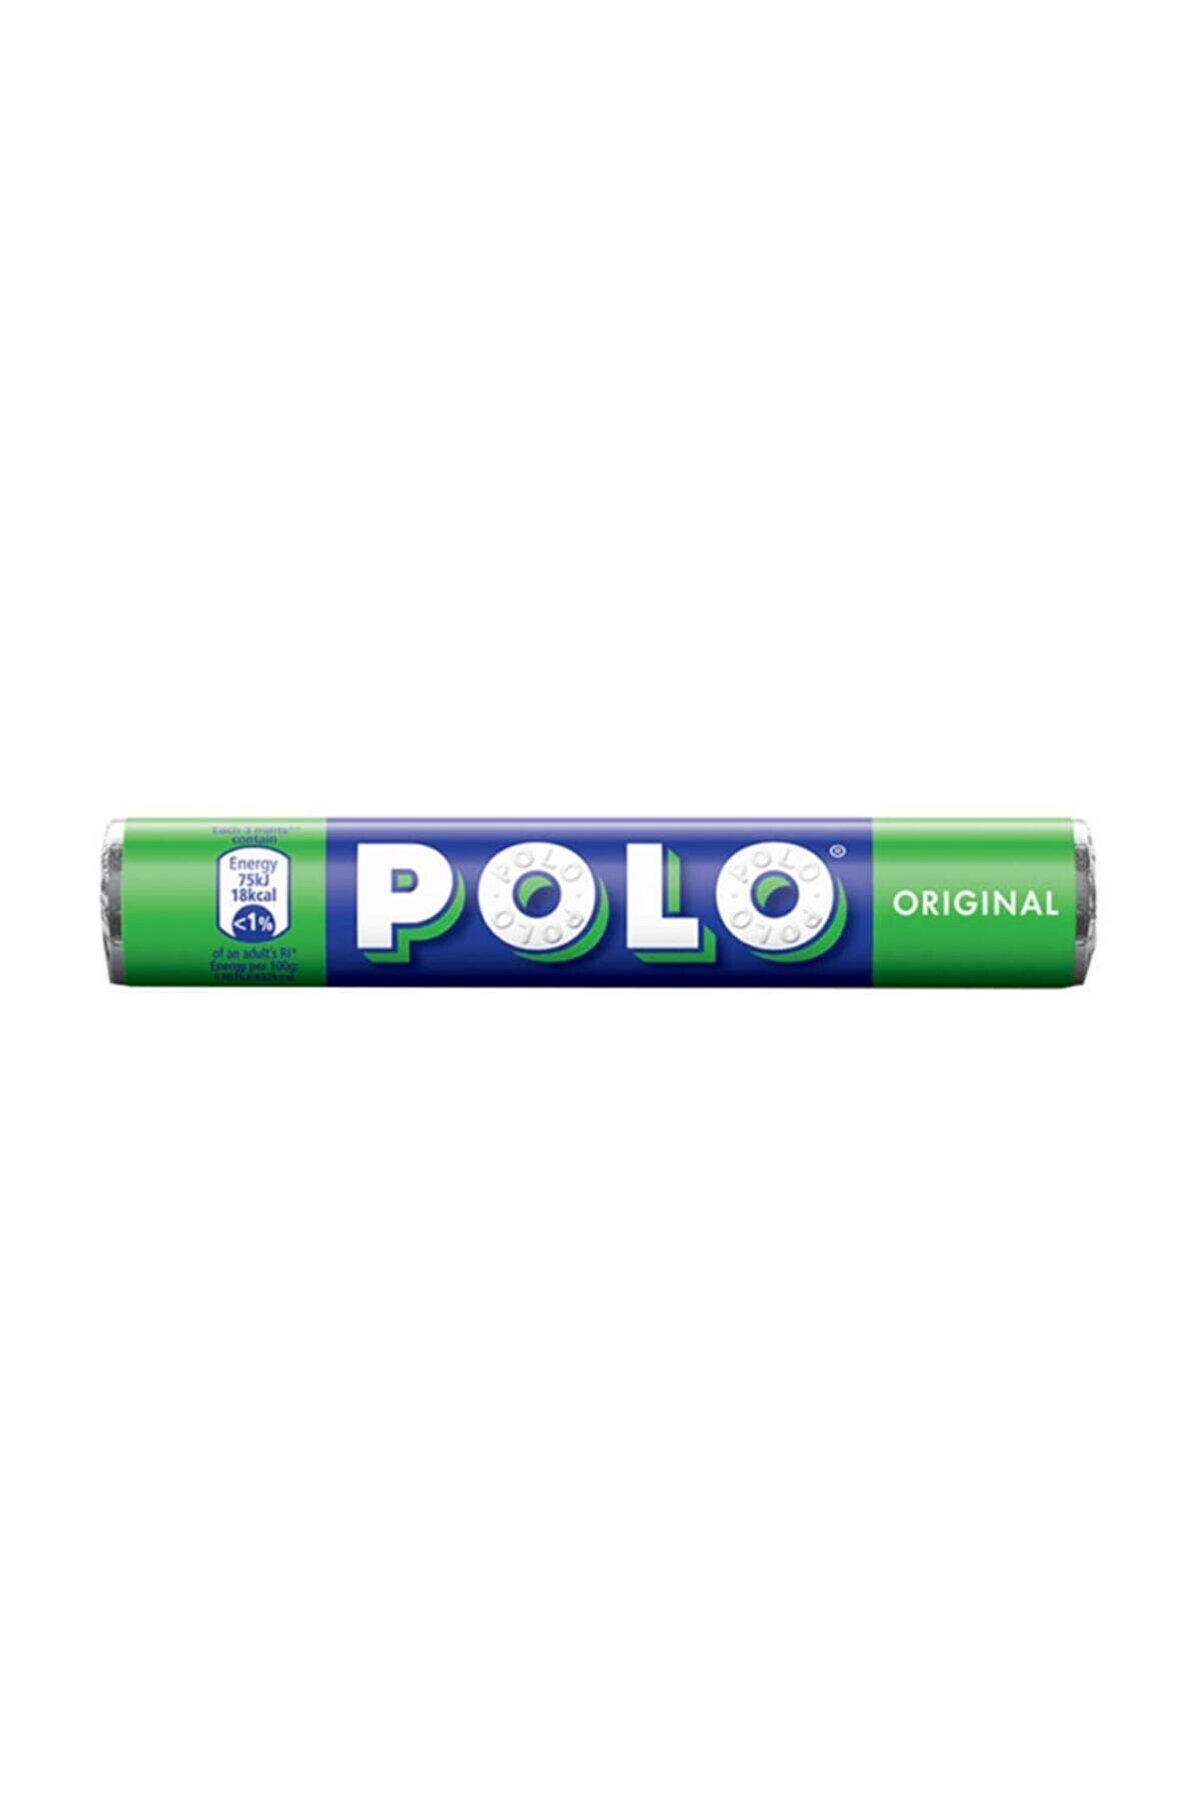 Nestle Polo Orjinal Delikli Naneli Şeker 33,4 gr